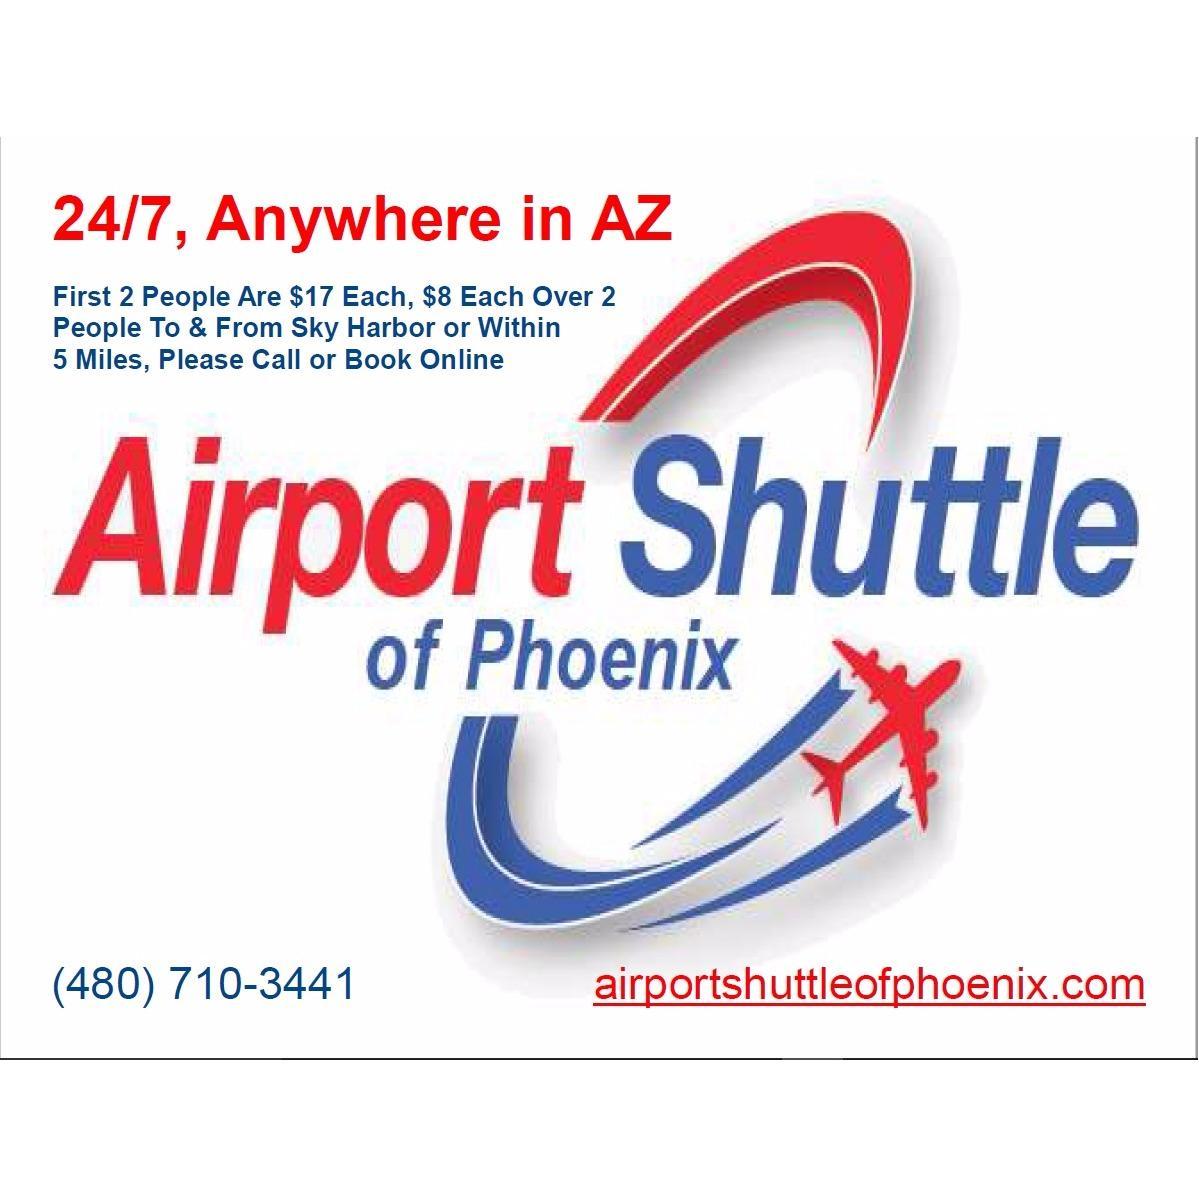 Airport Shuttle of Phoenix